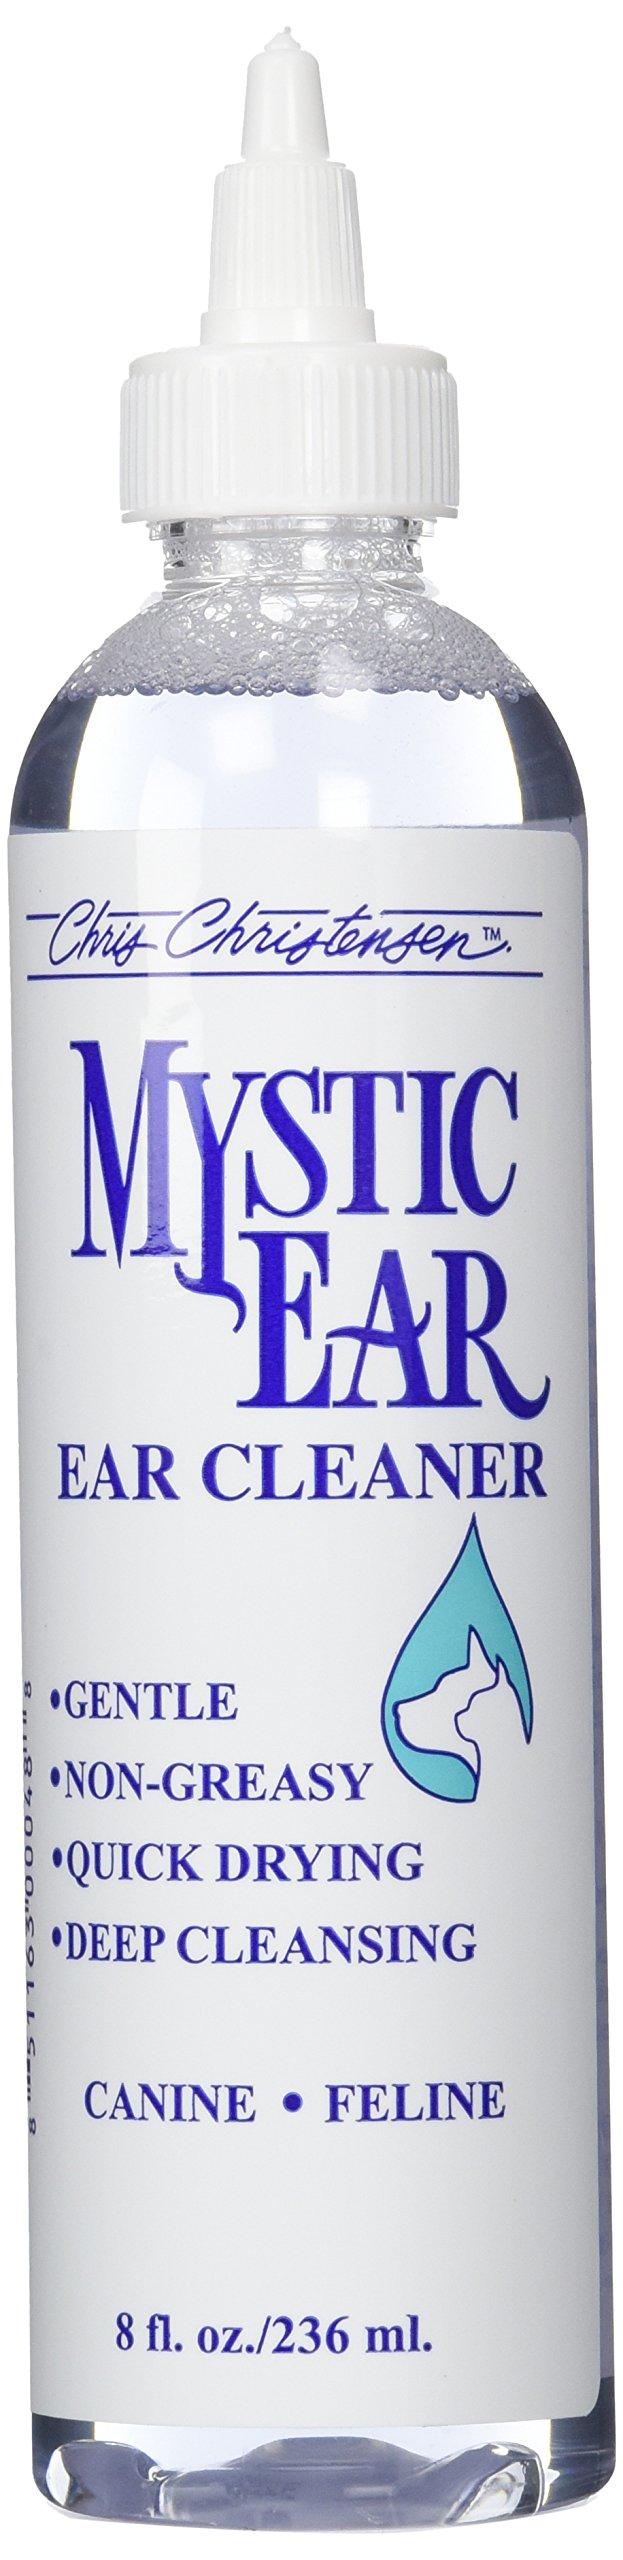 Mystic Ear 8 oz by Chris Christensen